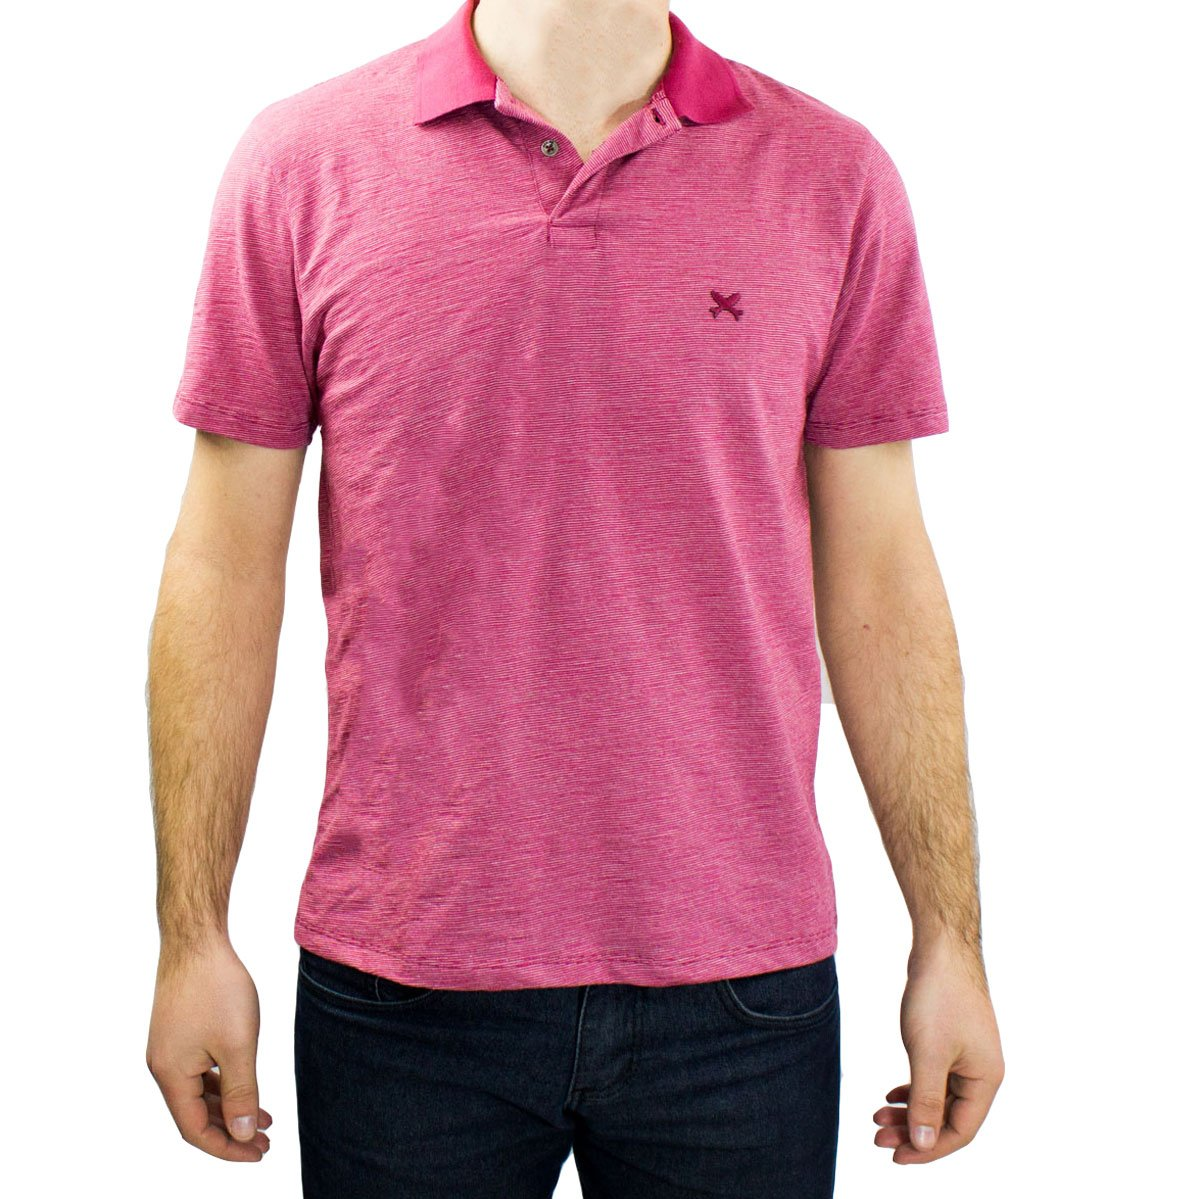 Bizz Store - Camisa Polo Masculina Hering Tal Pai Tal Filho 8cbc3922346